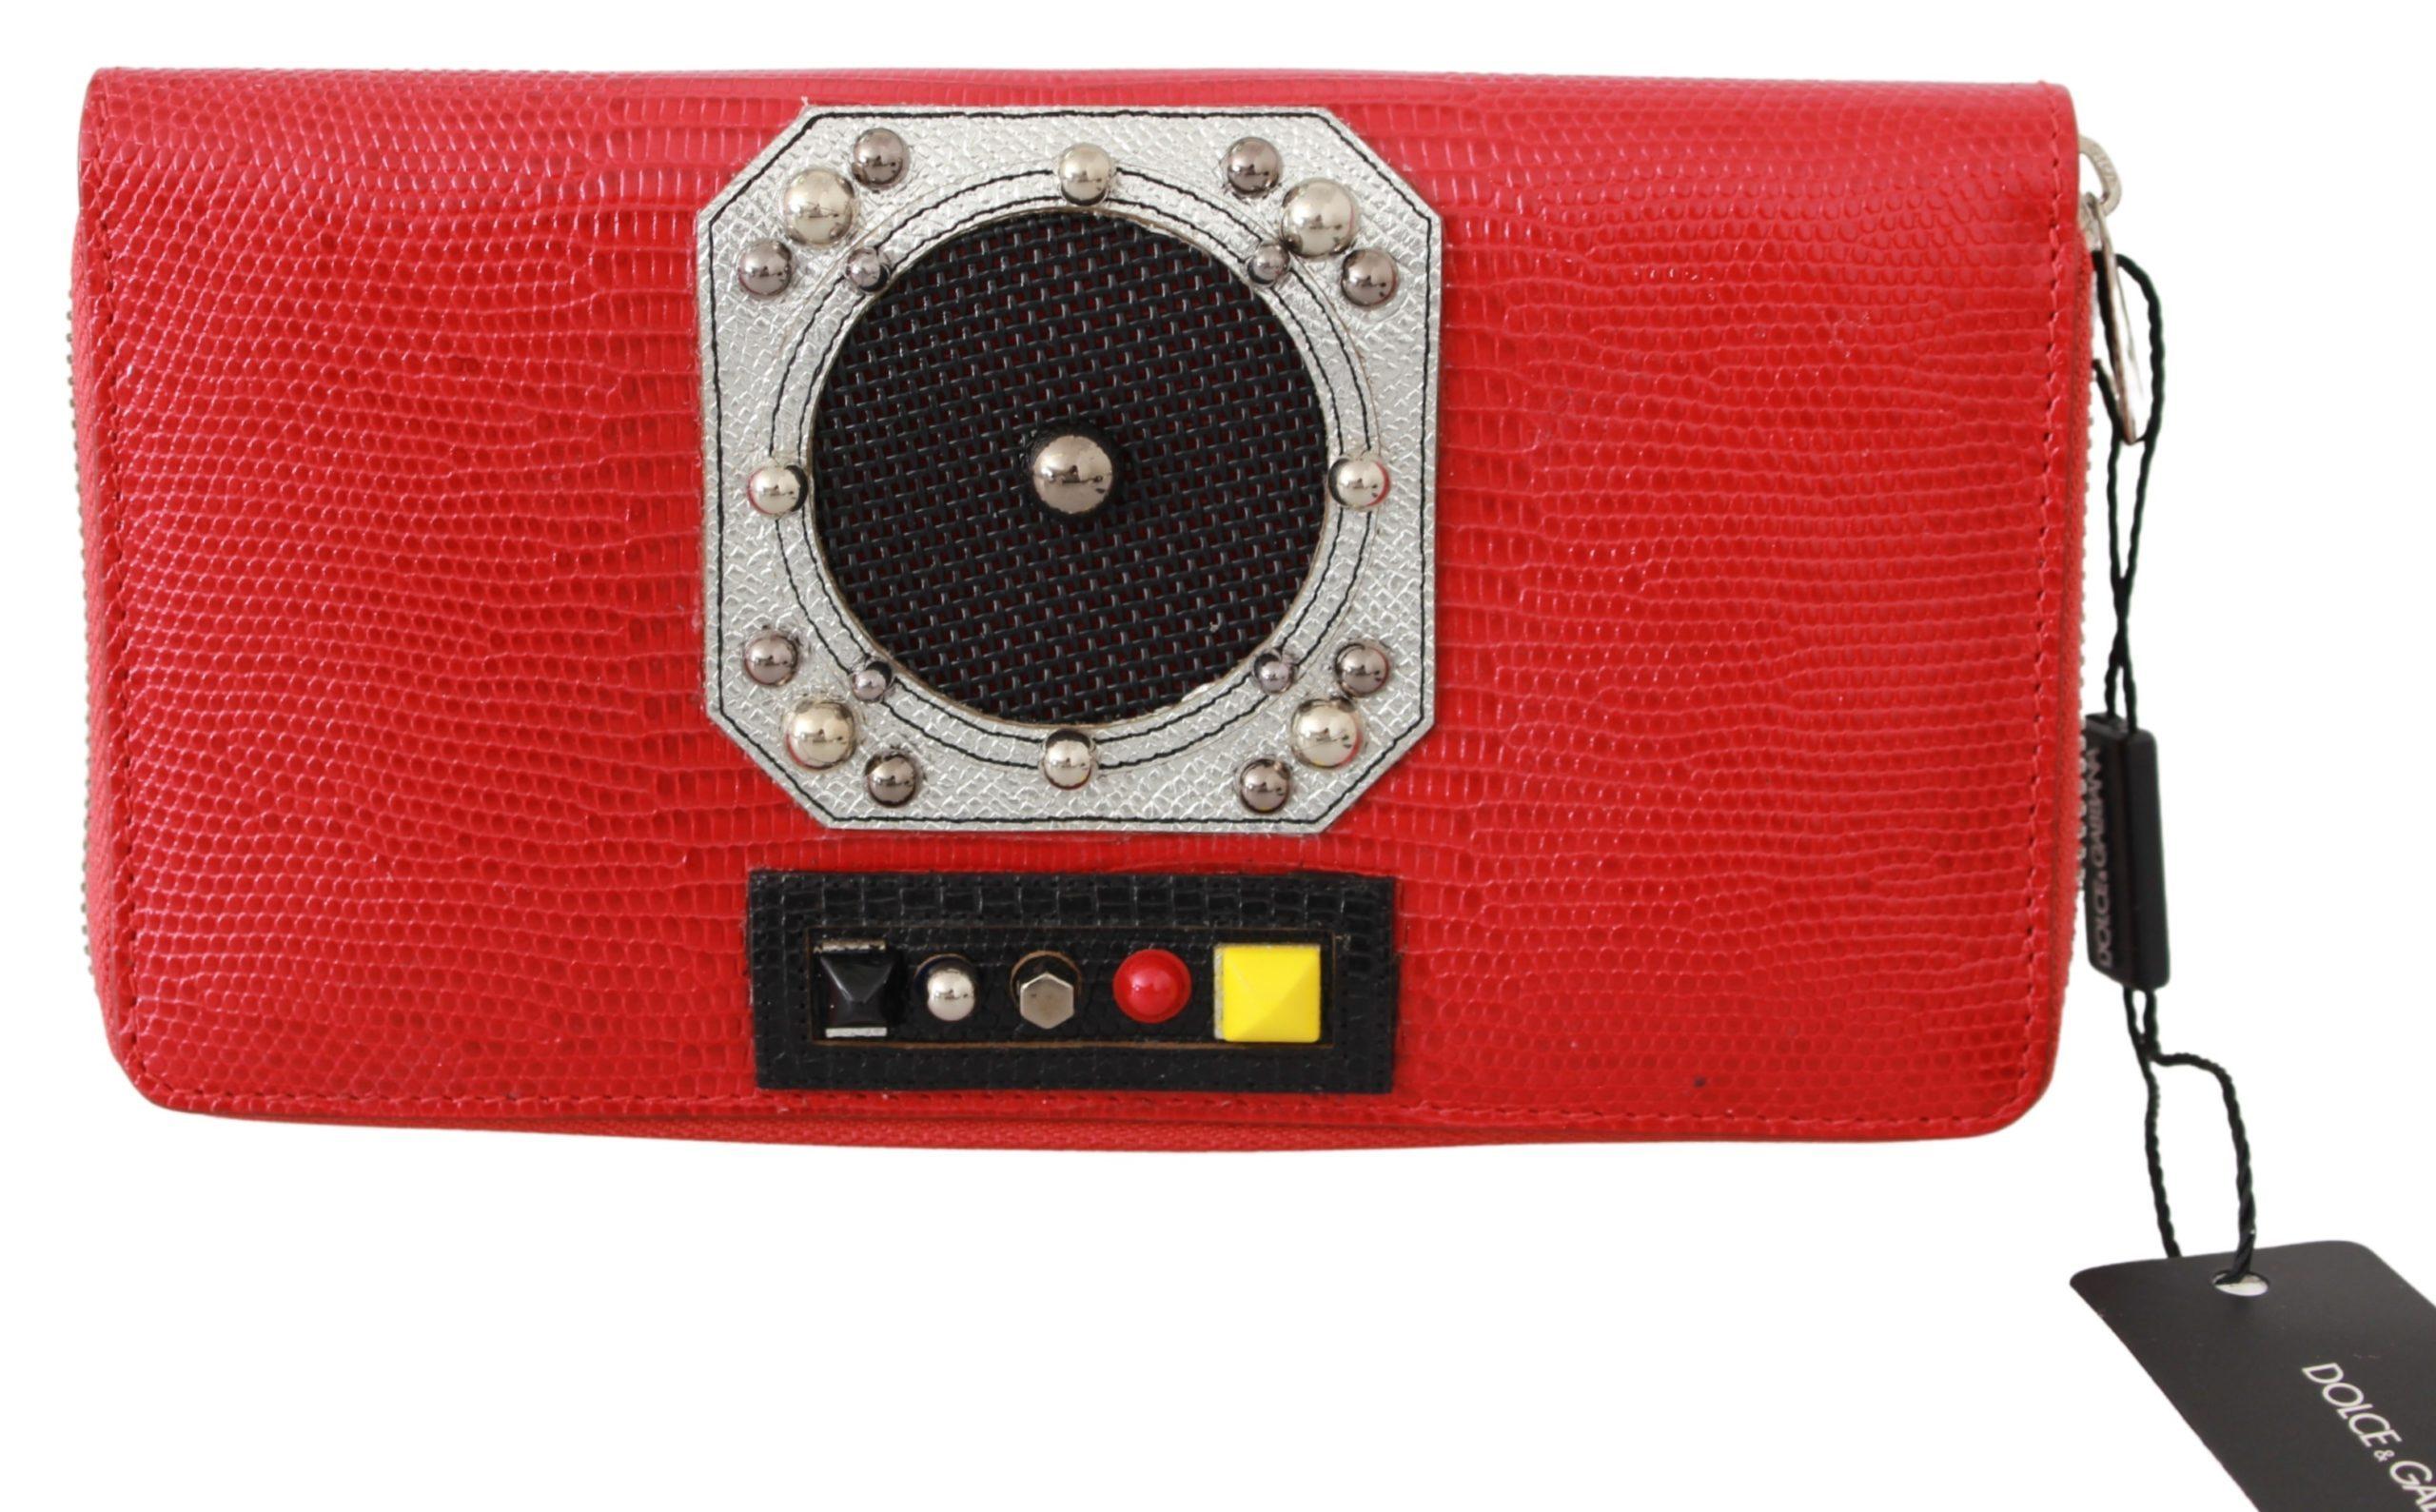 Dolce & Gabbana Women's Zippered Continental 100% Leather Clutch Wallet Red VAS9502